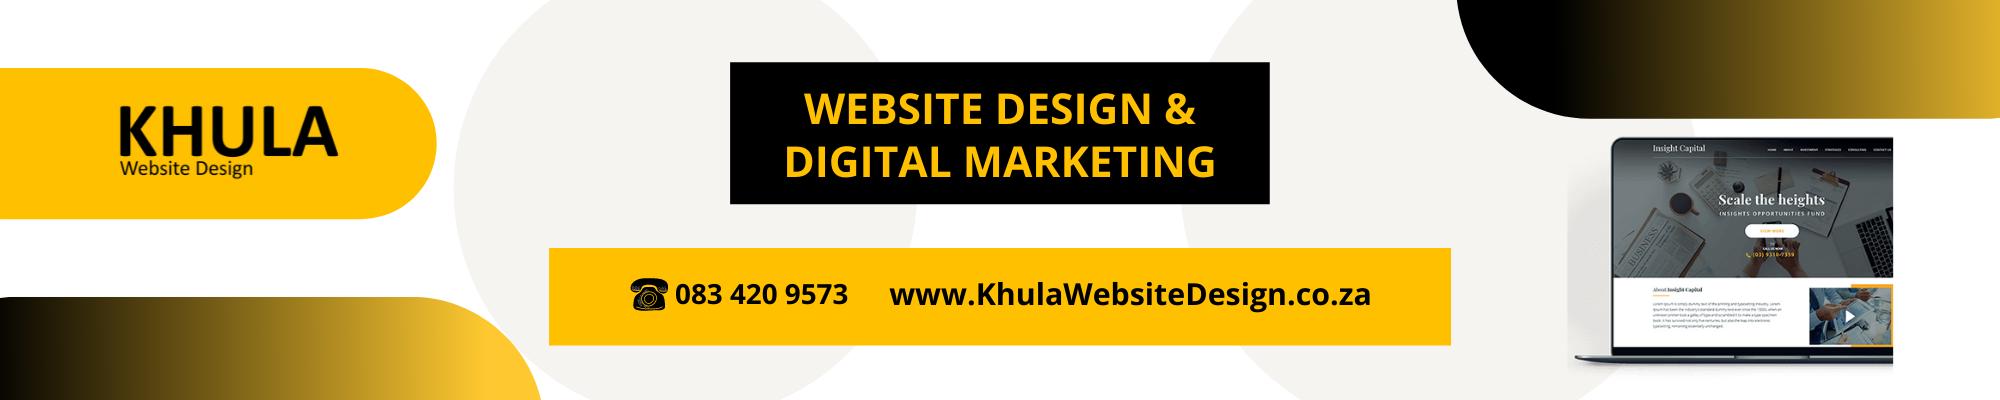 WEBSITE DESIGN & DIGITAL MARKETING